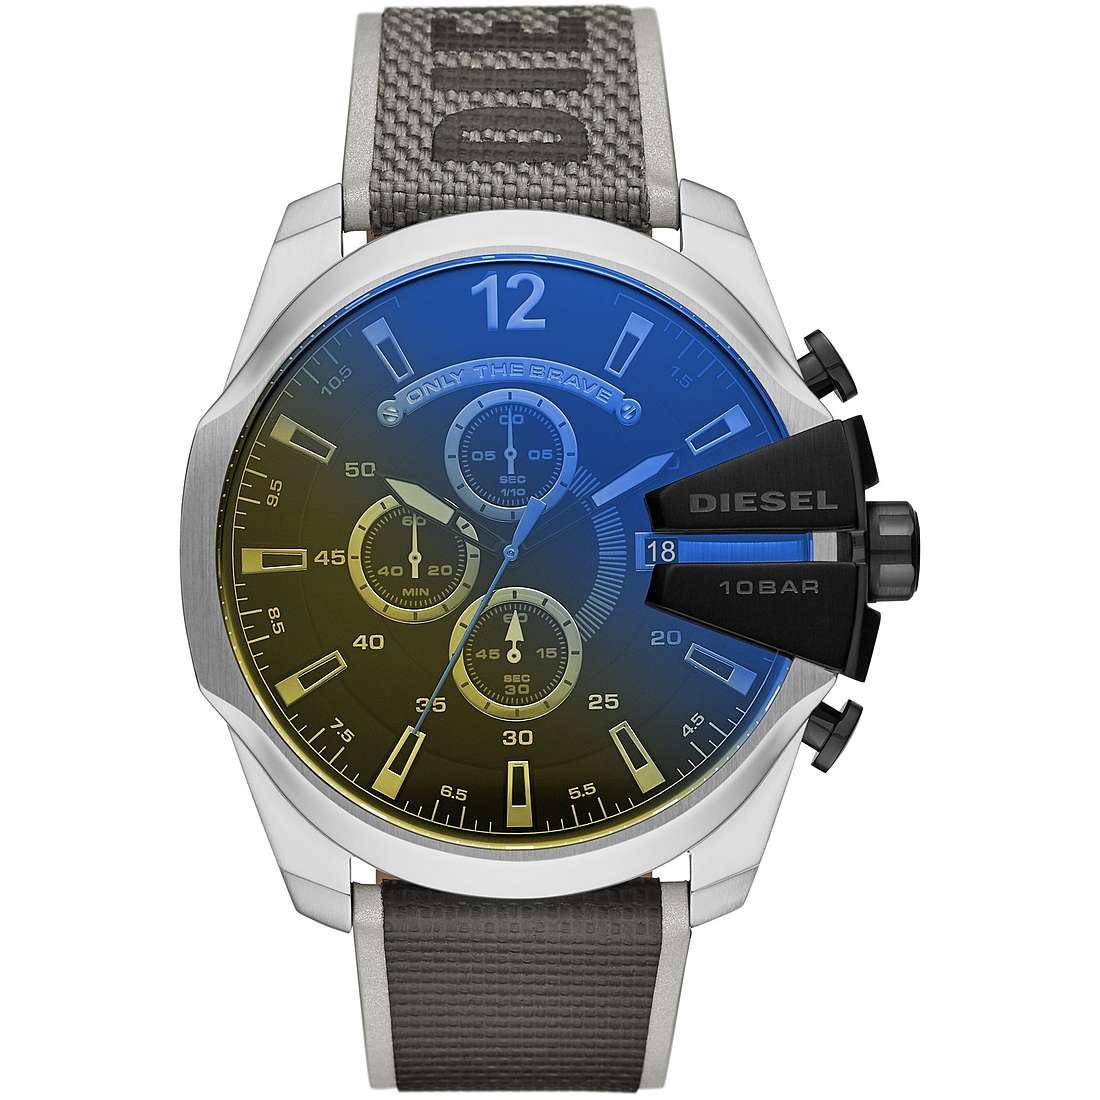 fucile difesa Fiduciosamente  orologio cronografo uomo Diesel Mega Chief DZ4523 cronografi Diesel